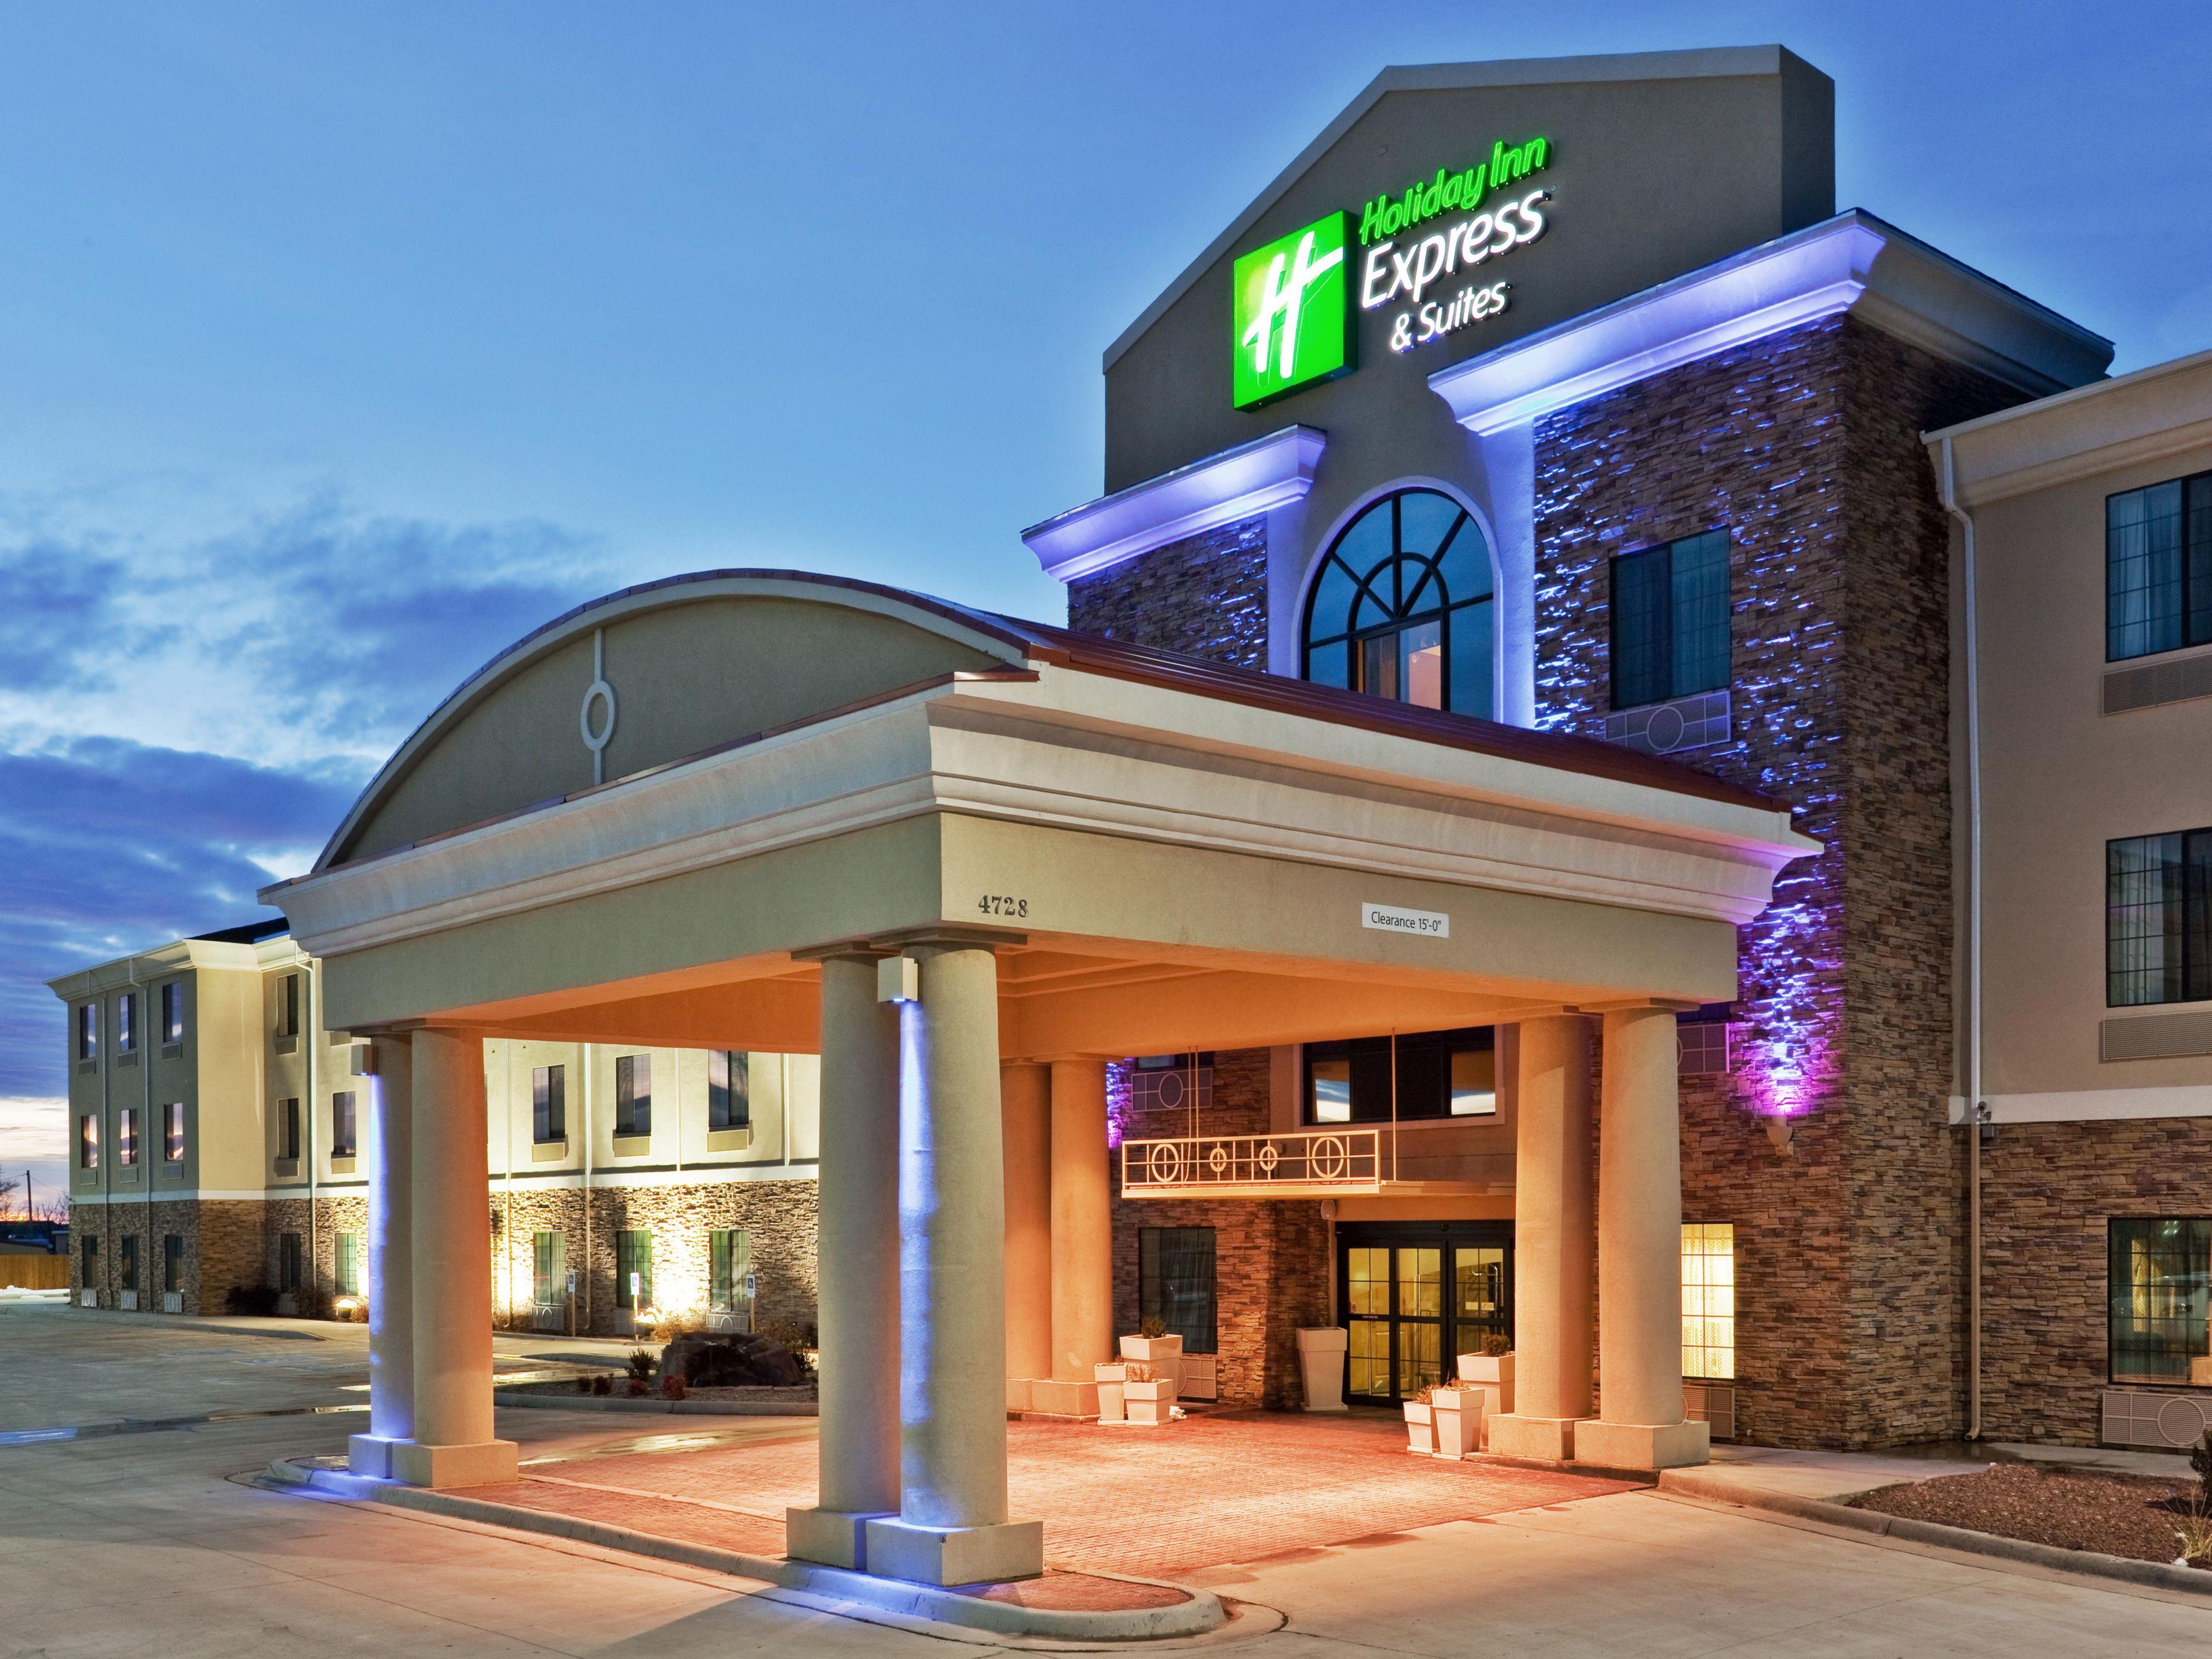 Holiday Inn Express Suites Clovis Hotel By Ihg